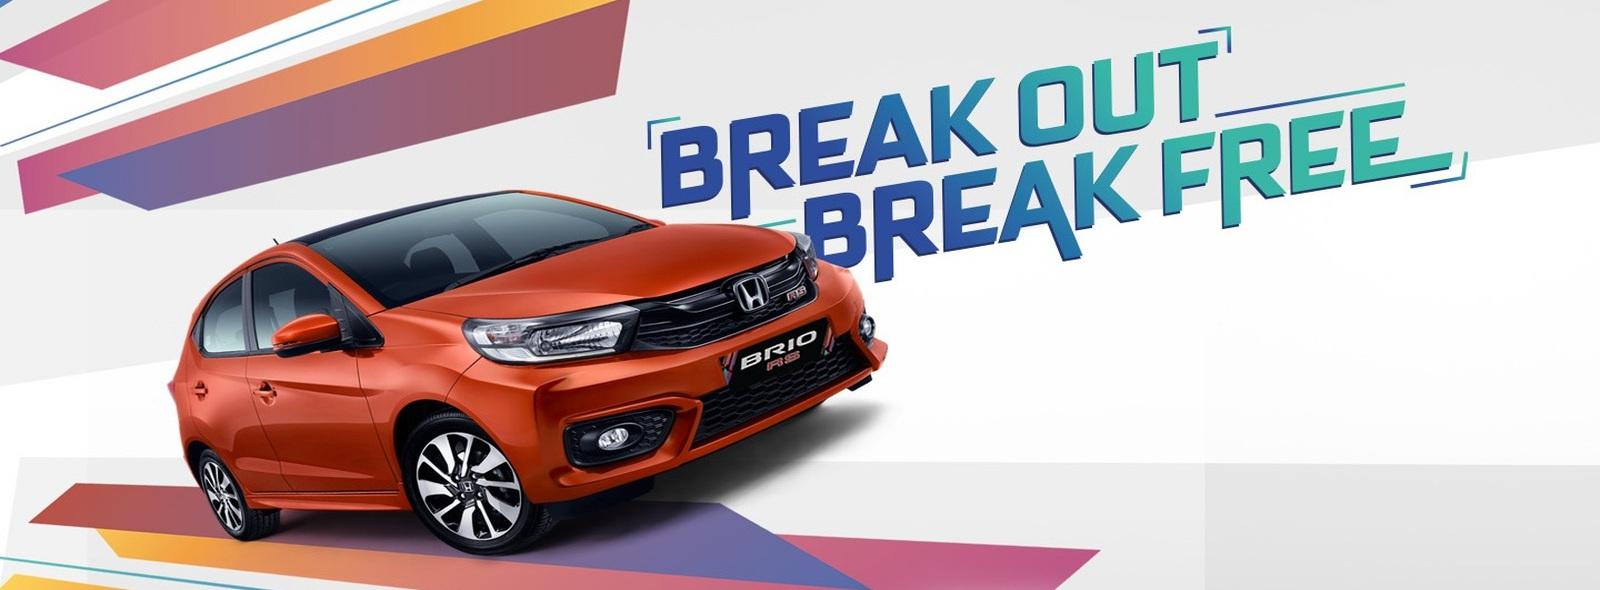 Daftar Harga Mobil Honda Makassar 2020 Honda Makassar